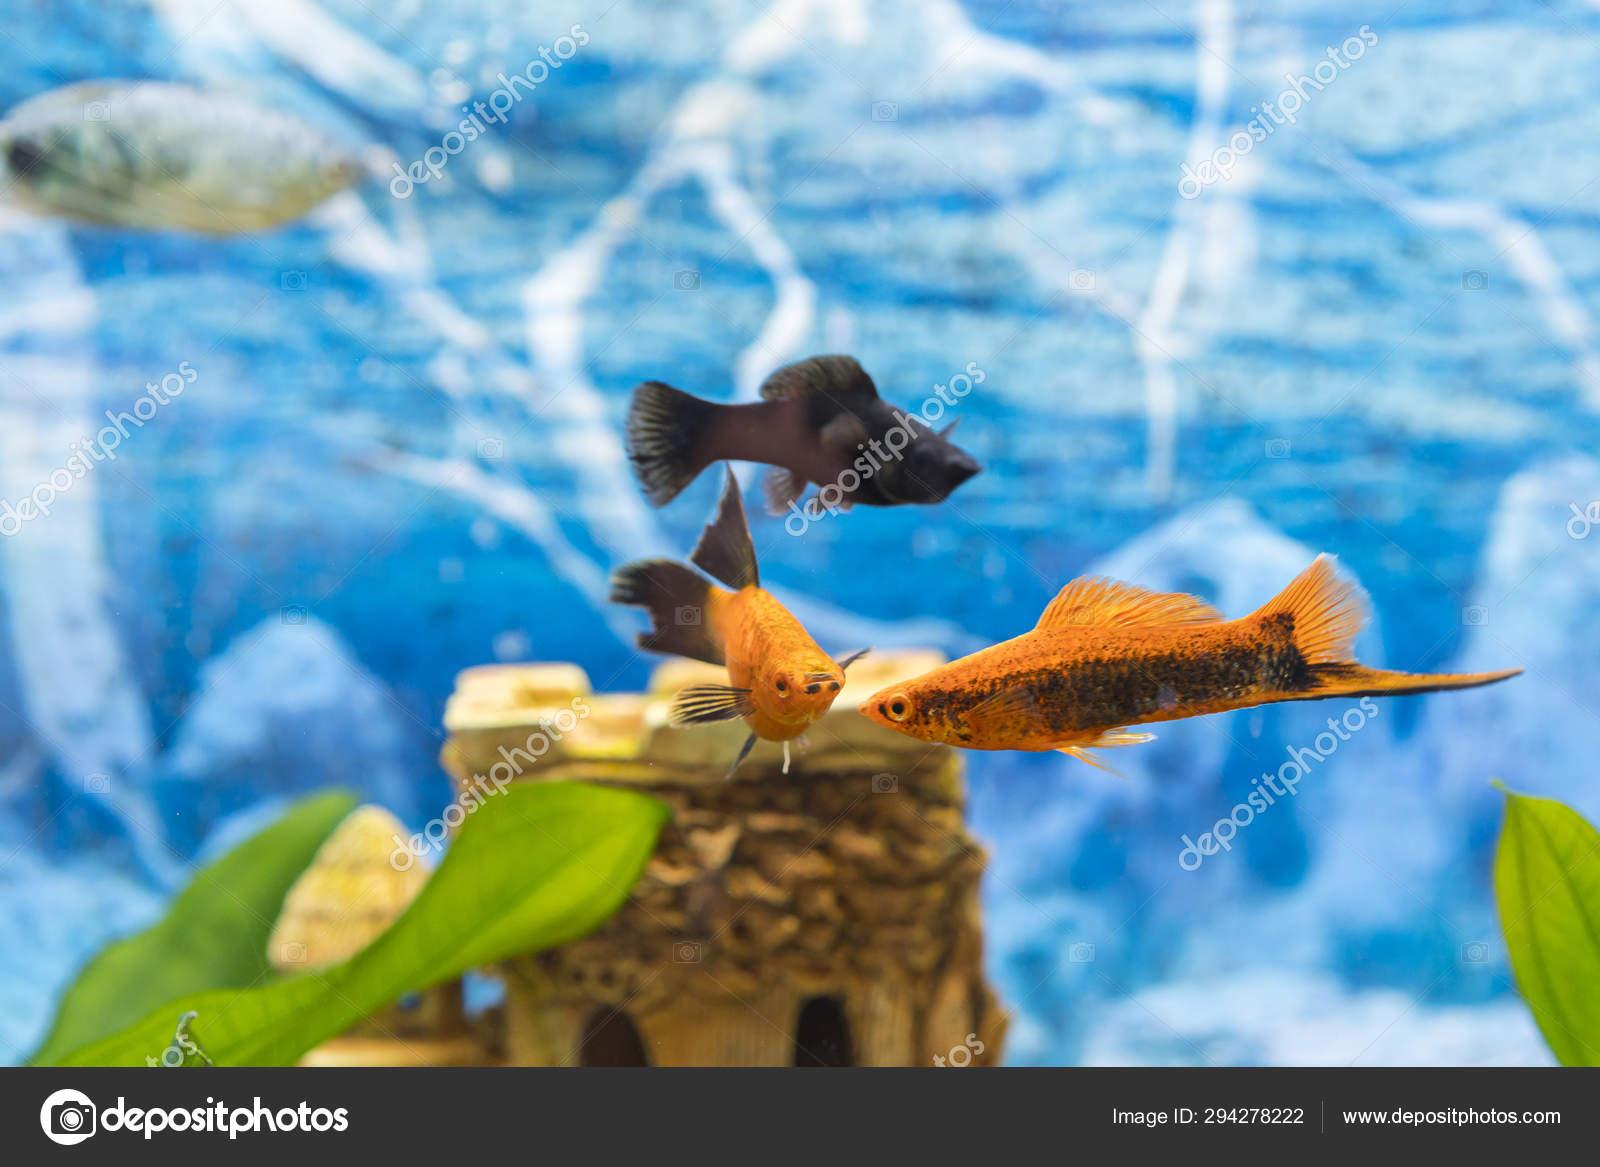 Black And Gold Fish In An Aquarium Colorful Fish In The Aquarium Beautiful Fish In The Aquarium Goldfish Aquarium A Fish On The Background Of Aquatic Plants Stock Photo C Colt Kiev Mail Ru 294278222